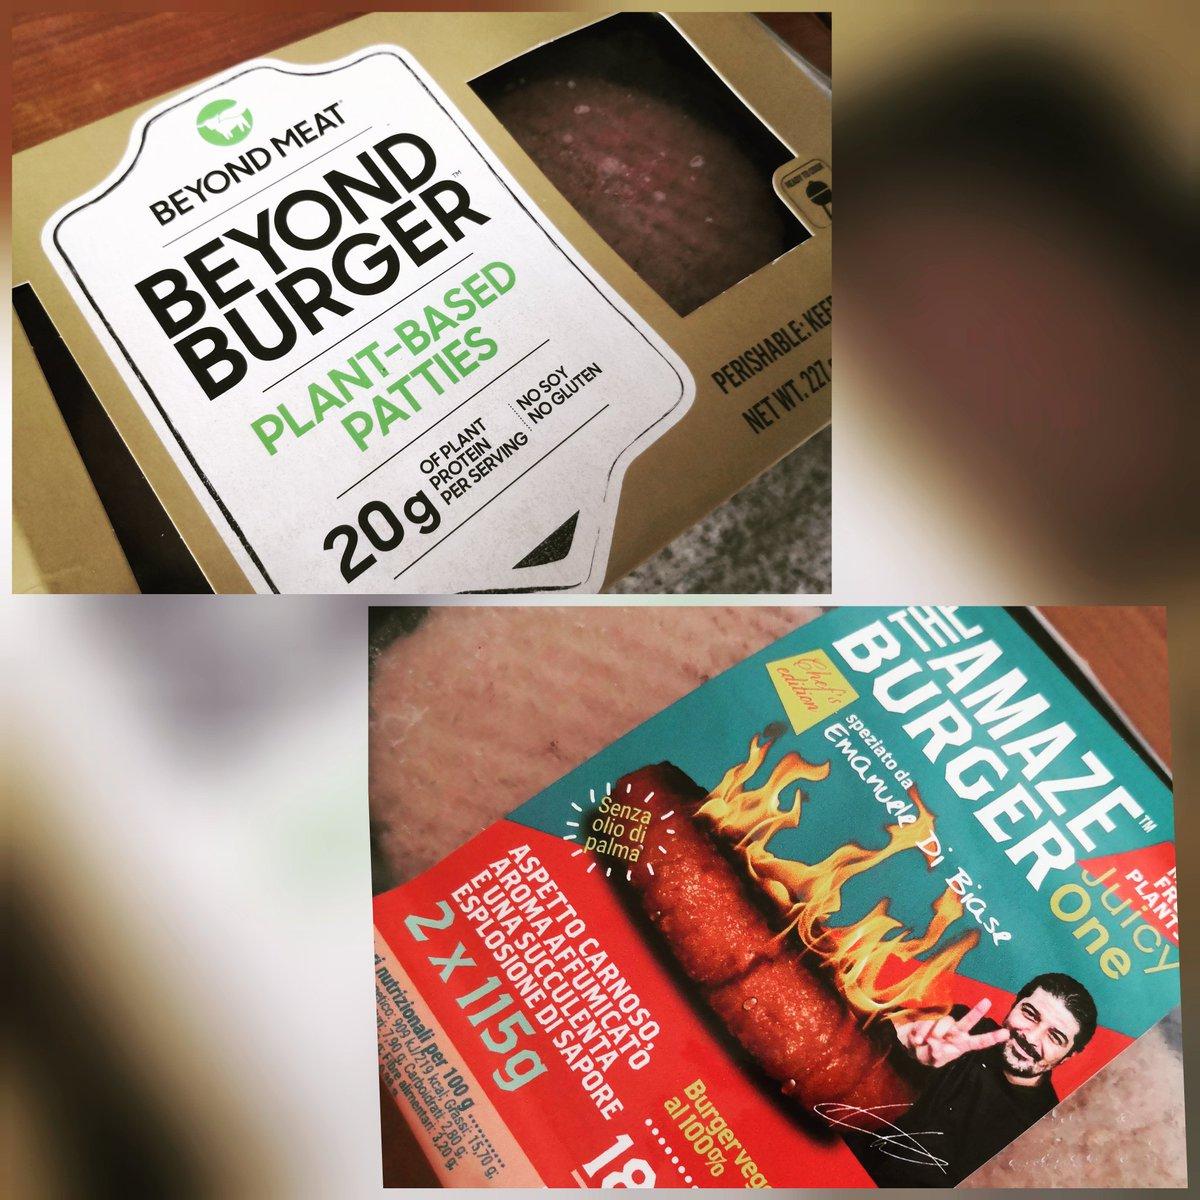 #beyondmeat #theamazeburger #noviolence#veganlove #gogreen #vegan #govegan #vegeansofig #vegancommunity #veggie #instalike #instamood #instagood #picoftheday #love #inlove